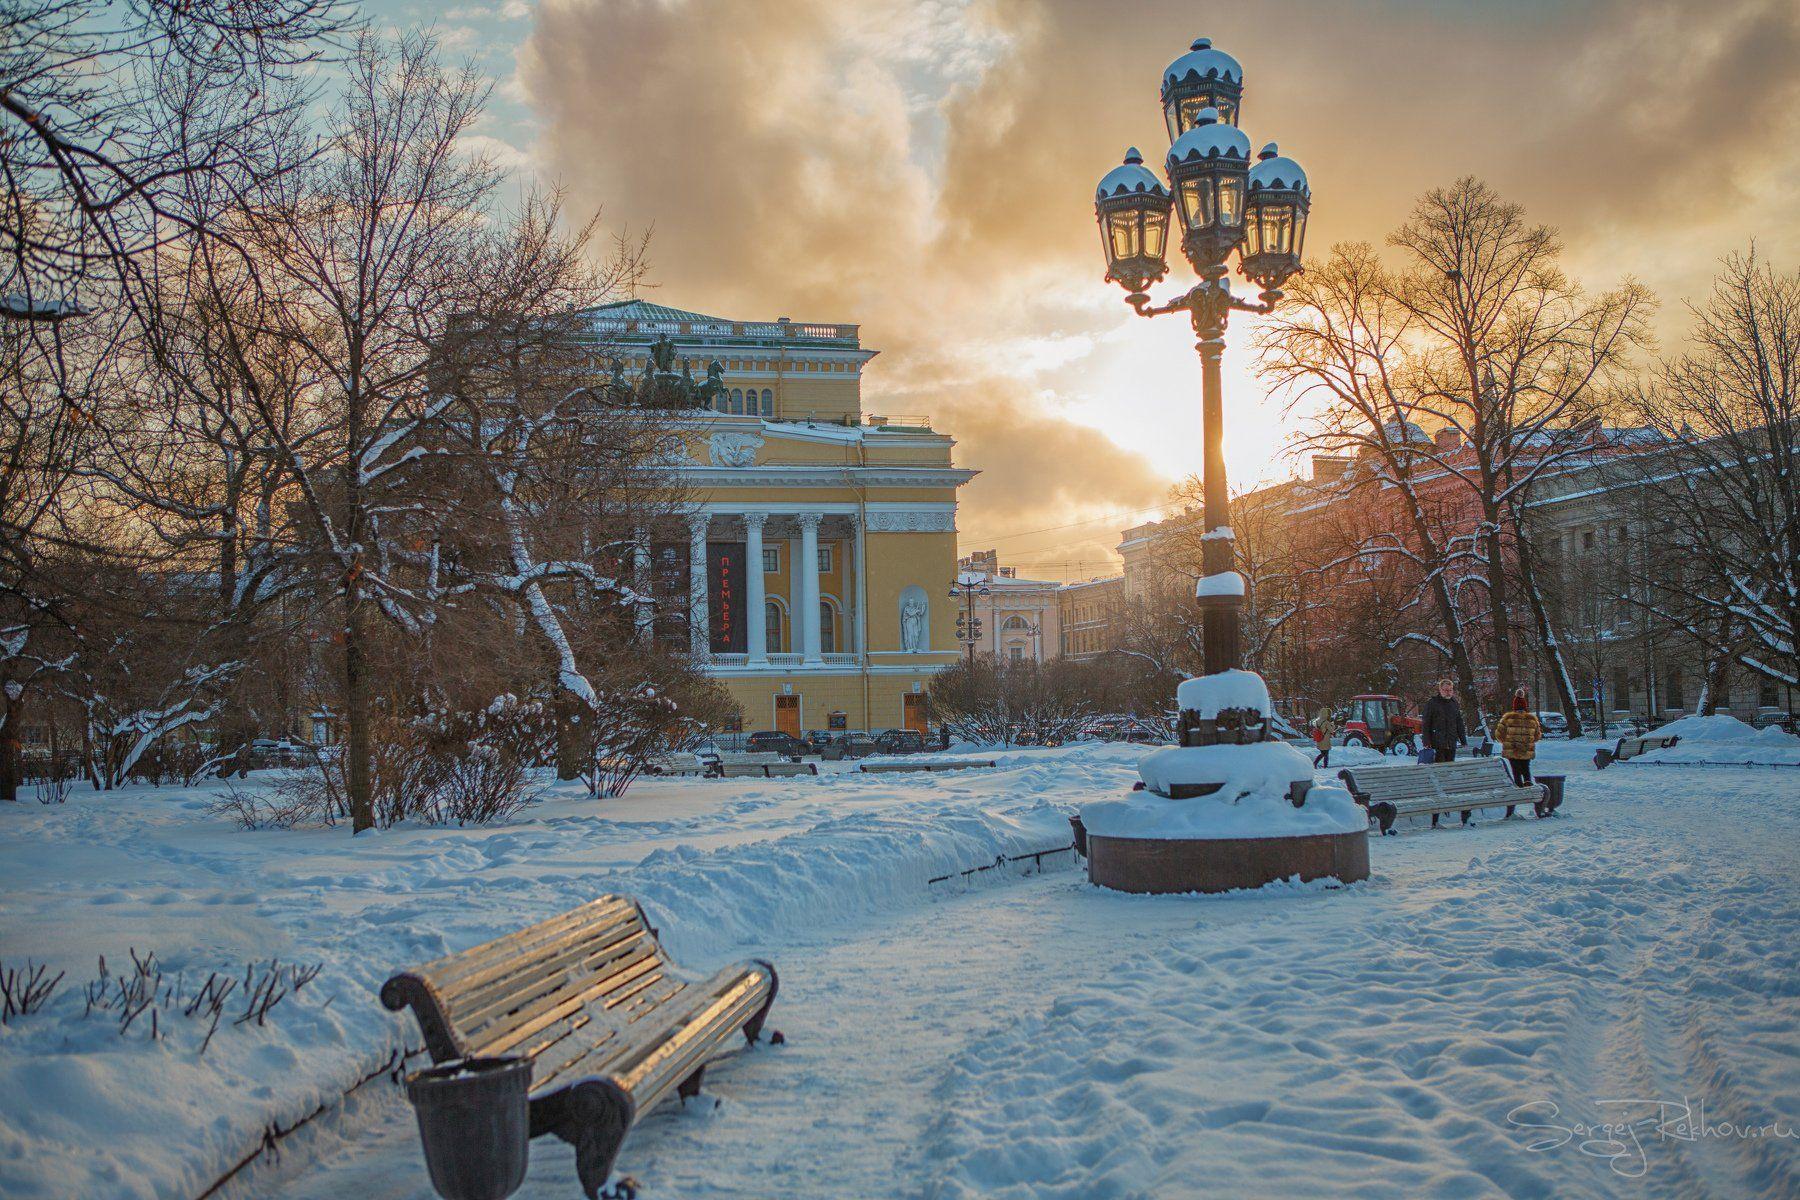 питер, санкт-петербург, зима, вечер, закат, мороз, рехов, сергейрехов, rekhov, sergejrekhov, Сергей Рехов